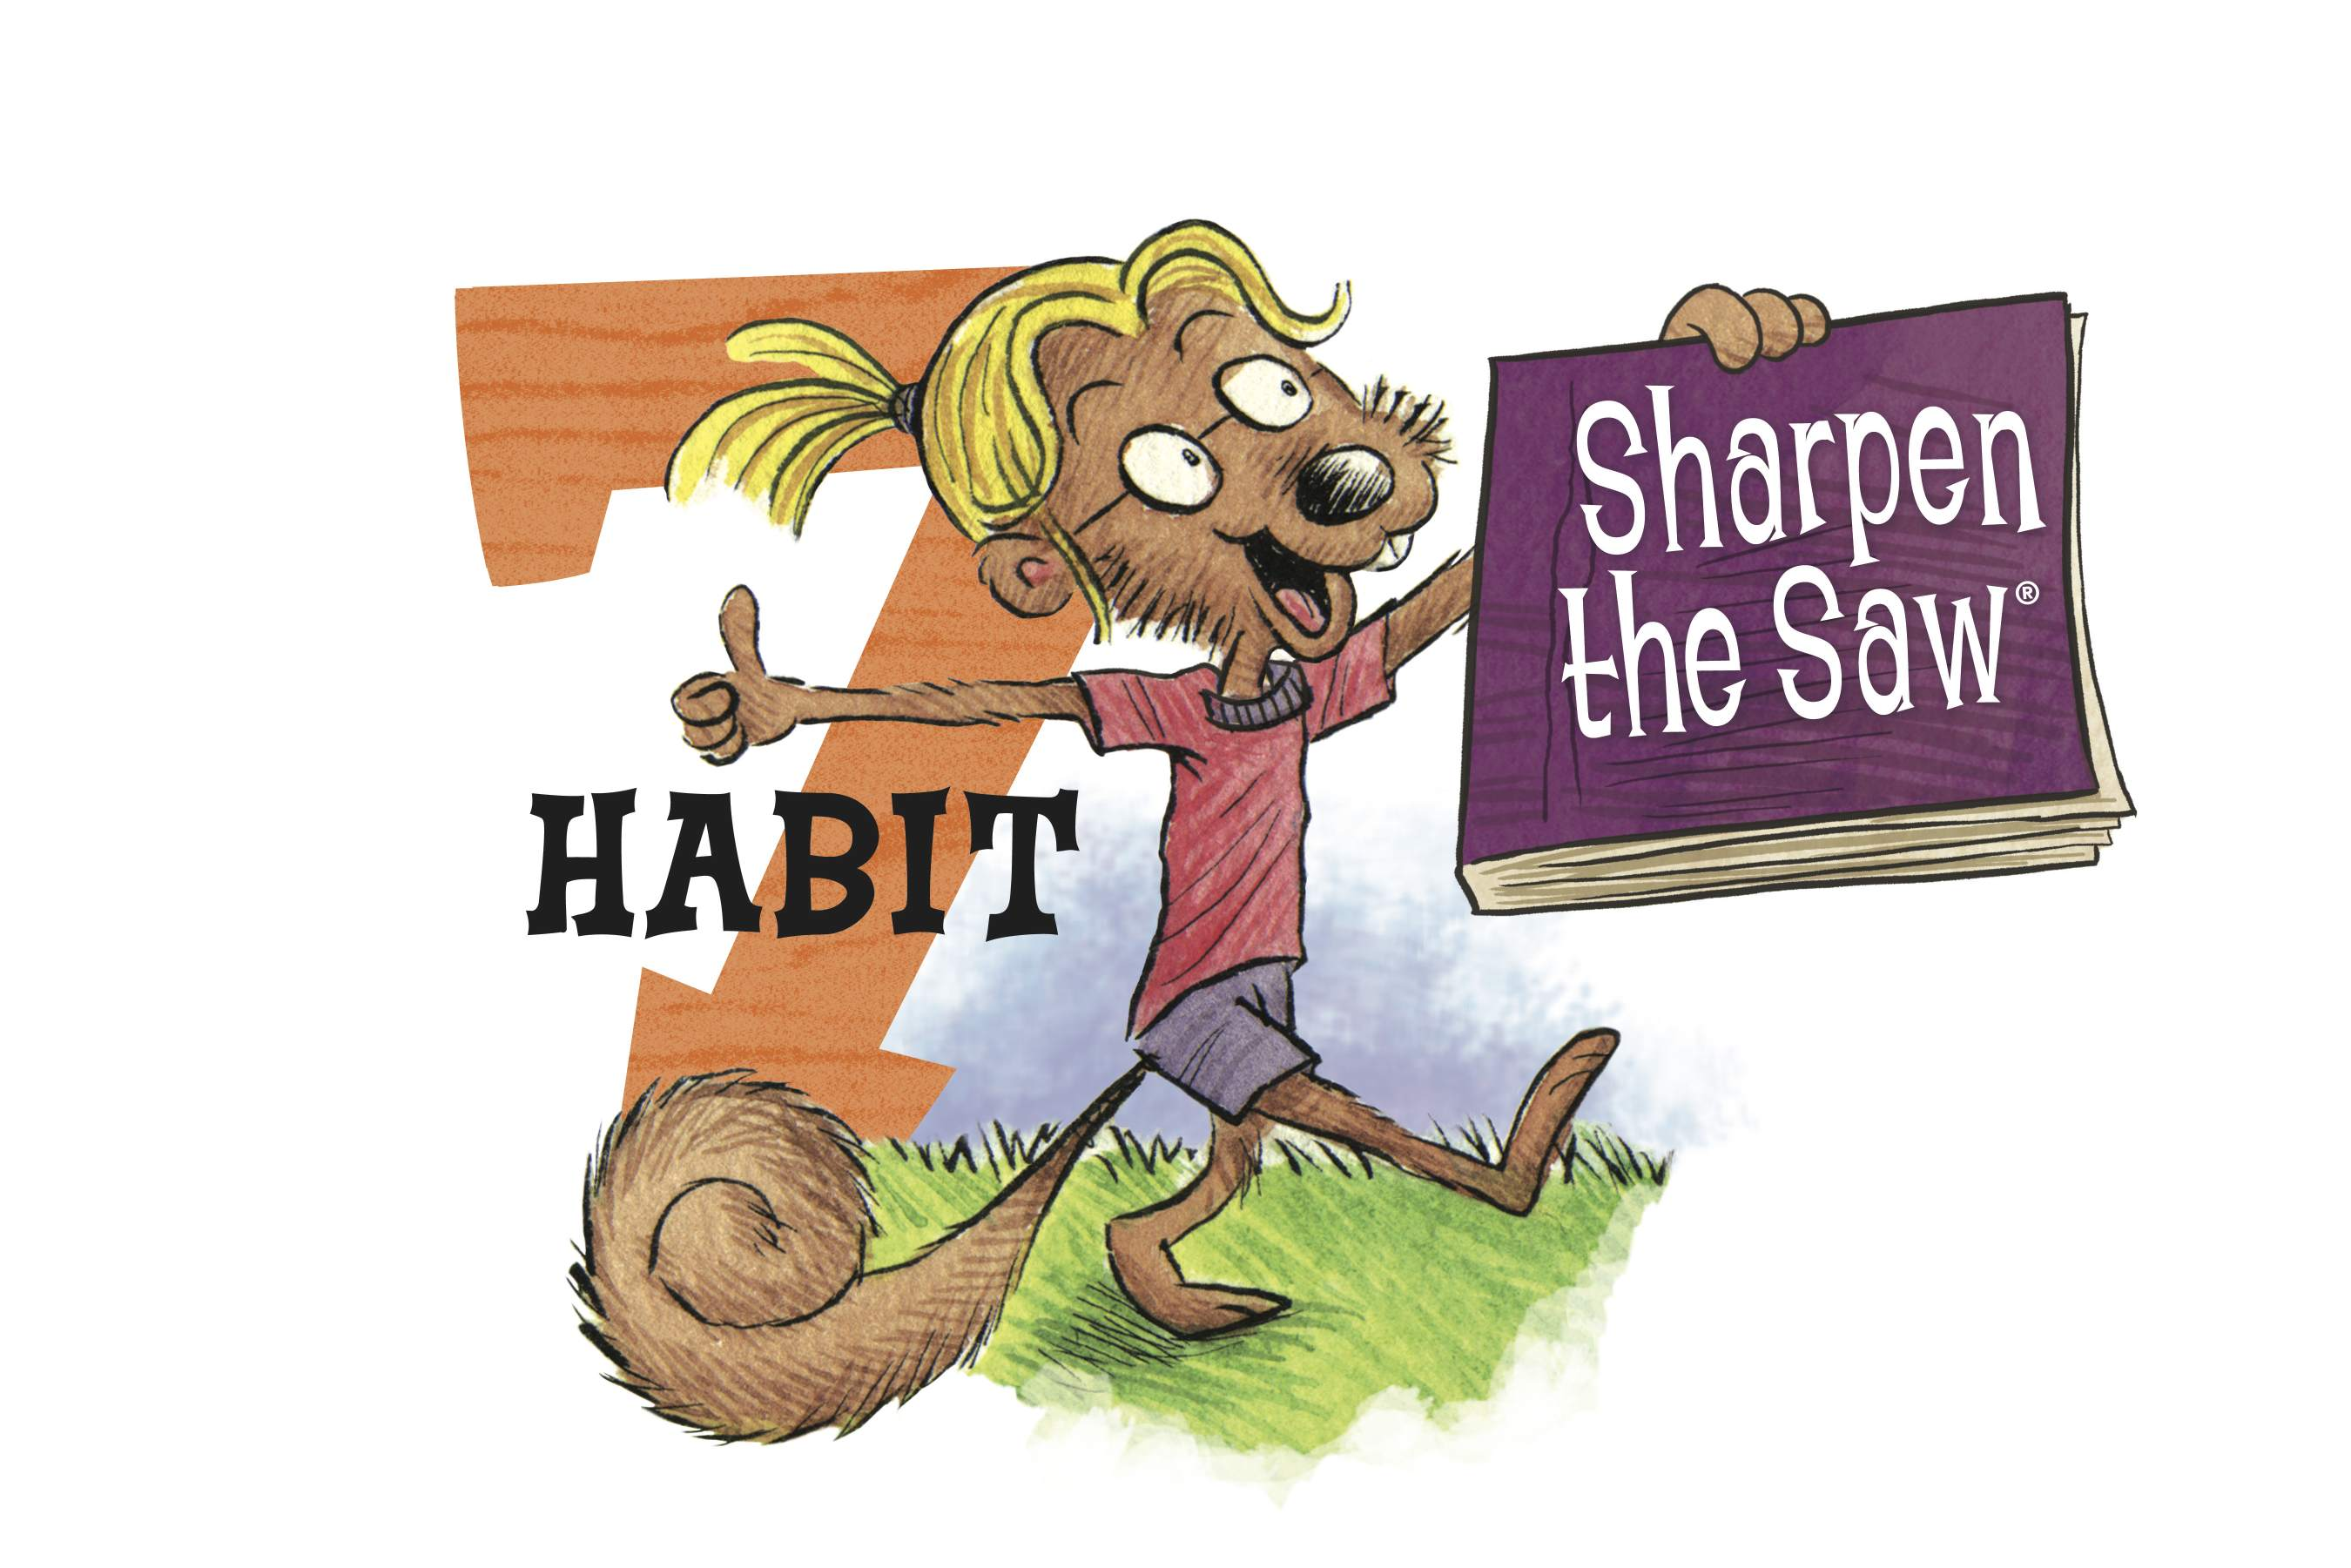 Preparatory Academy The Seven Habits Habit 7 Sharpen The Saw.